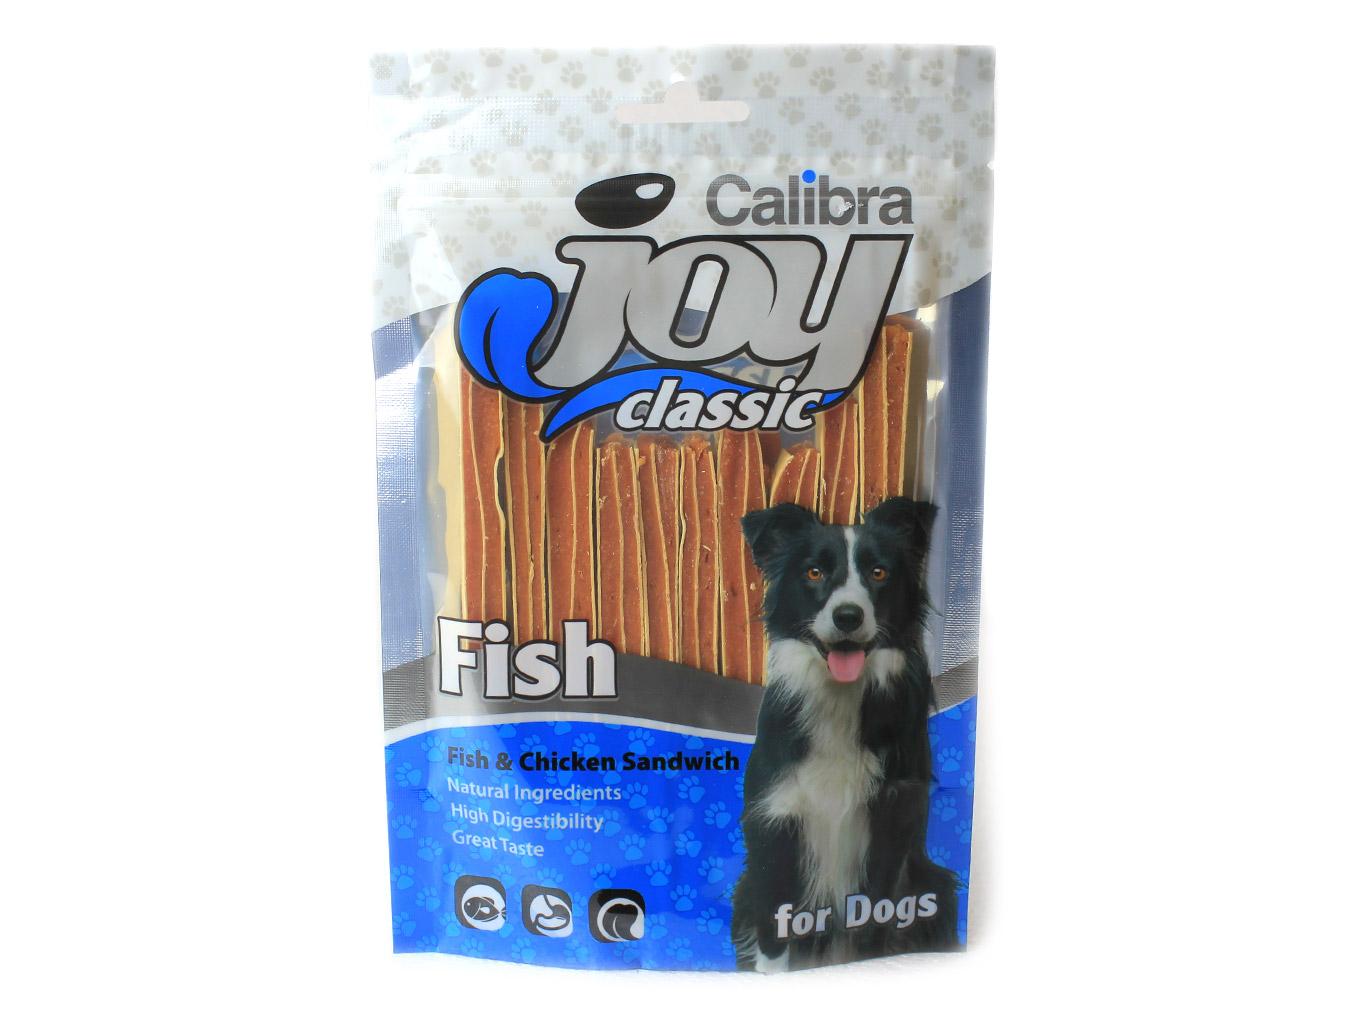 Calibra Joy Chicken and Fish Sandwich 80 g